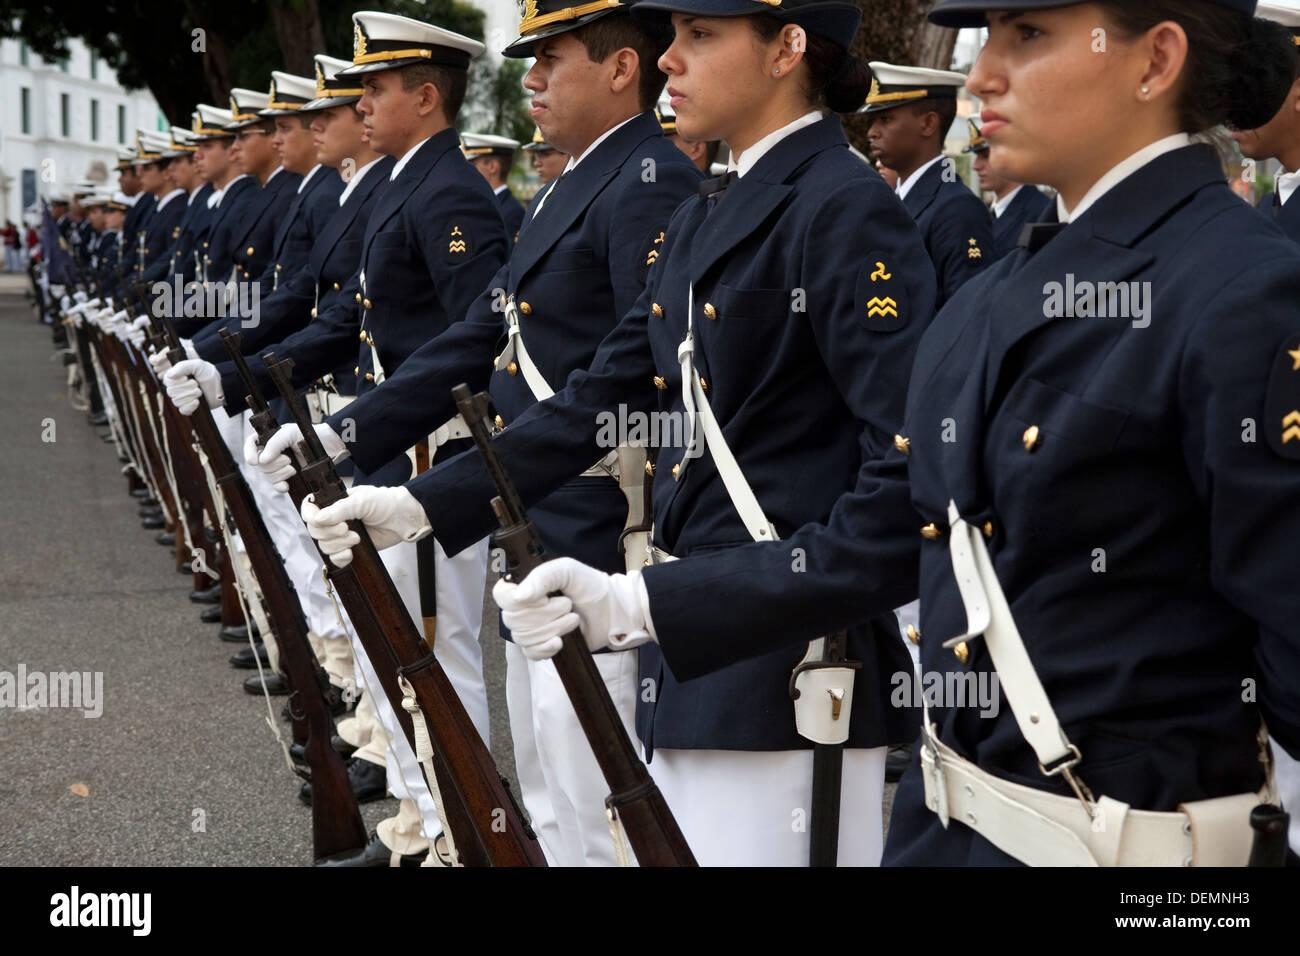 Military Parade next to Fort Presépio. - Stock Image